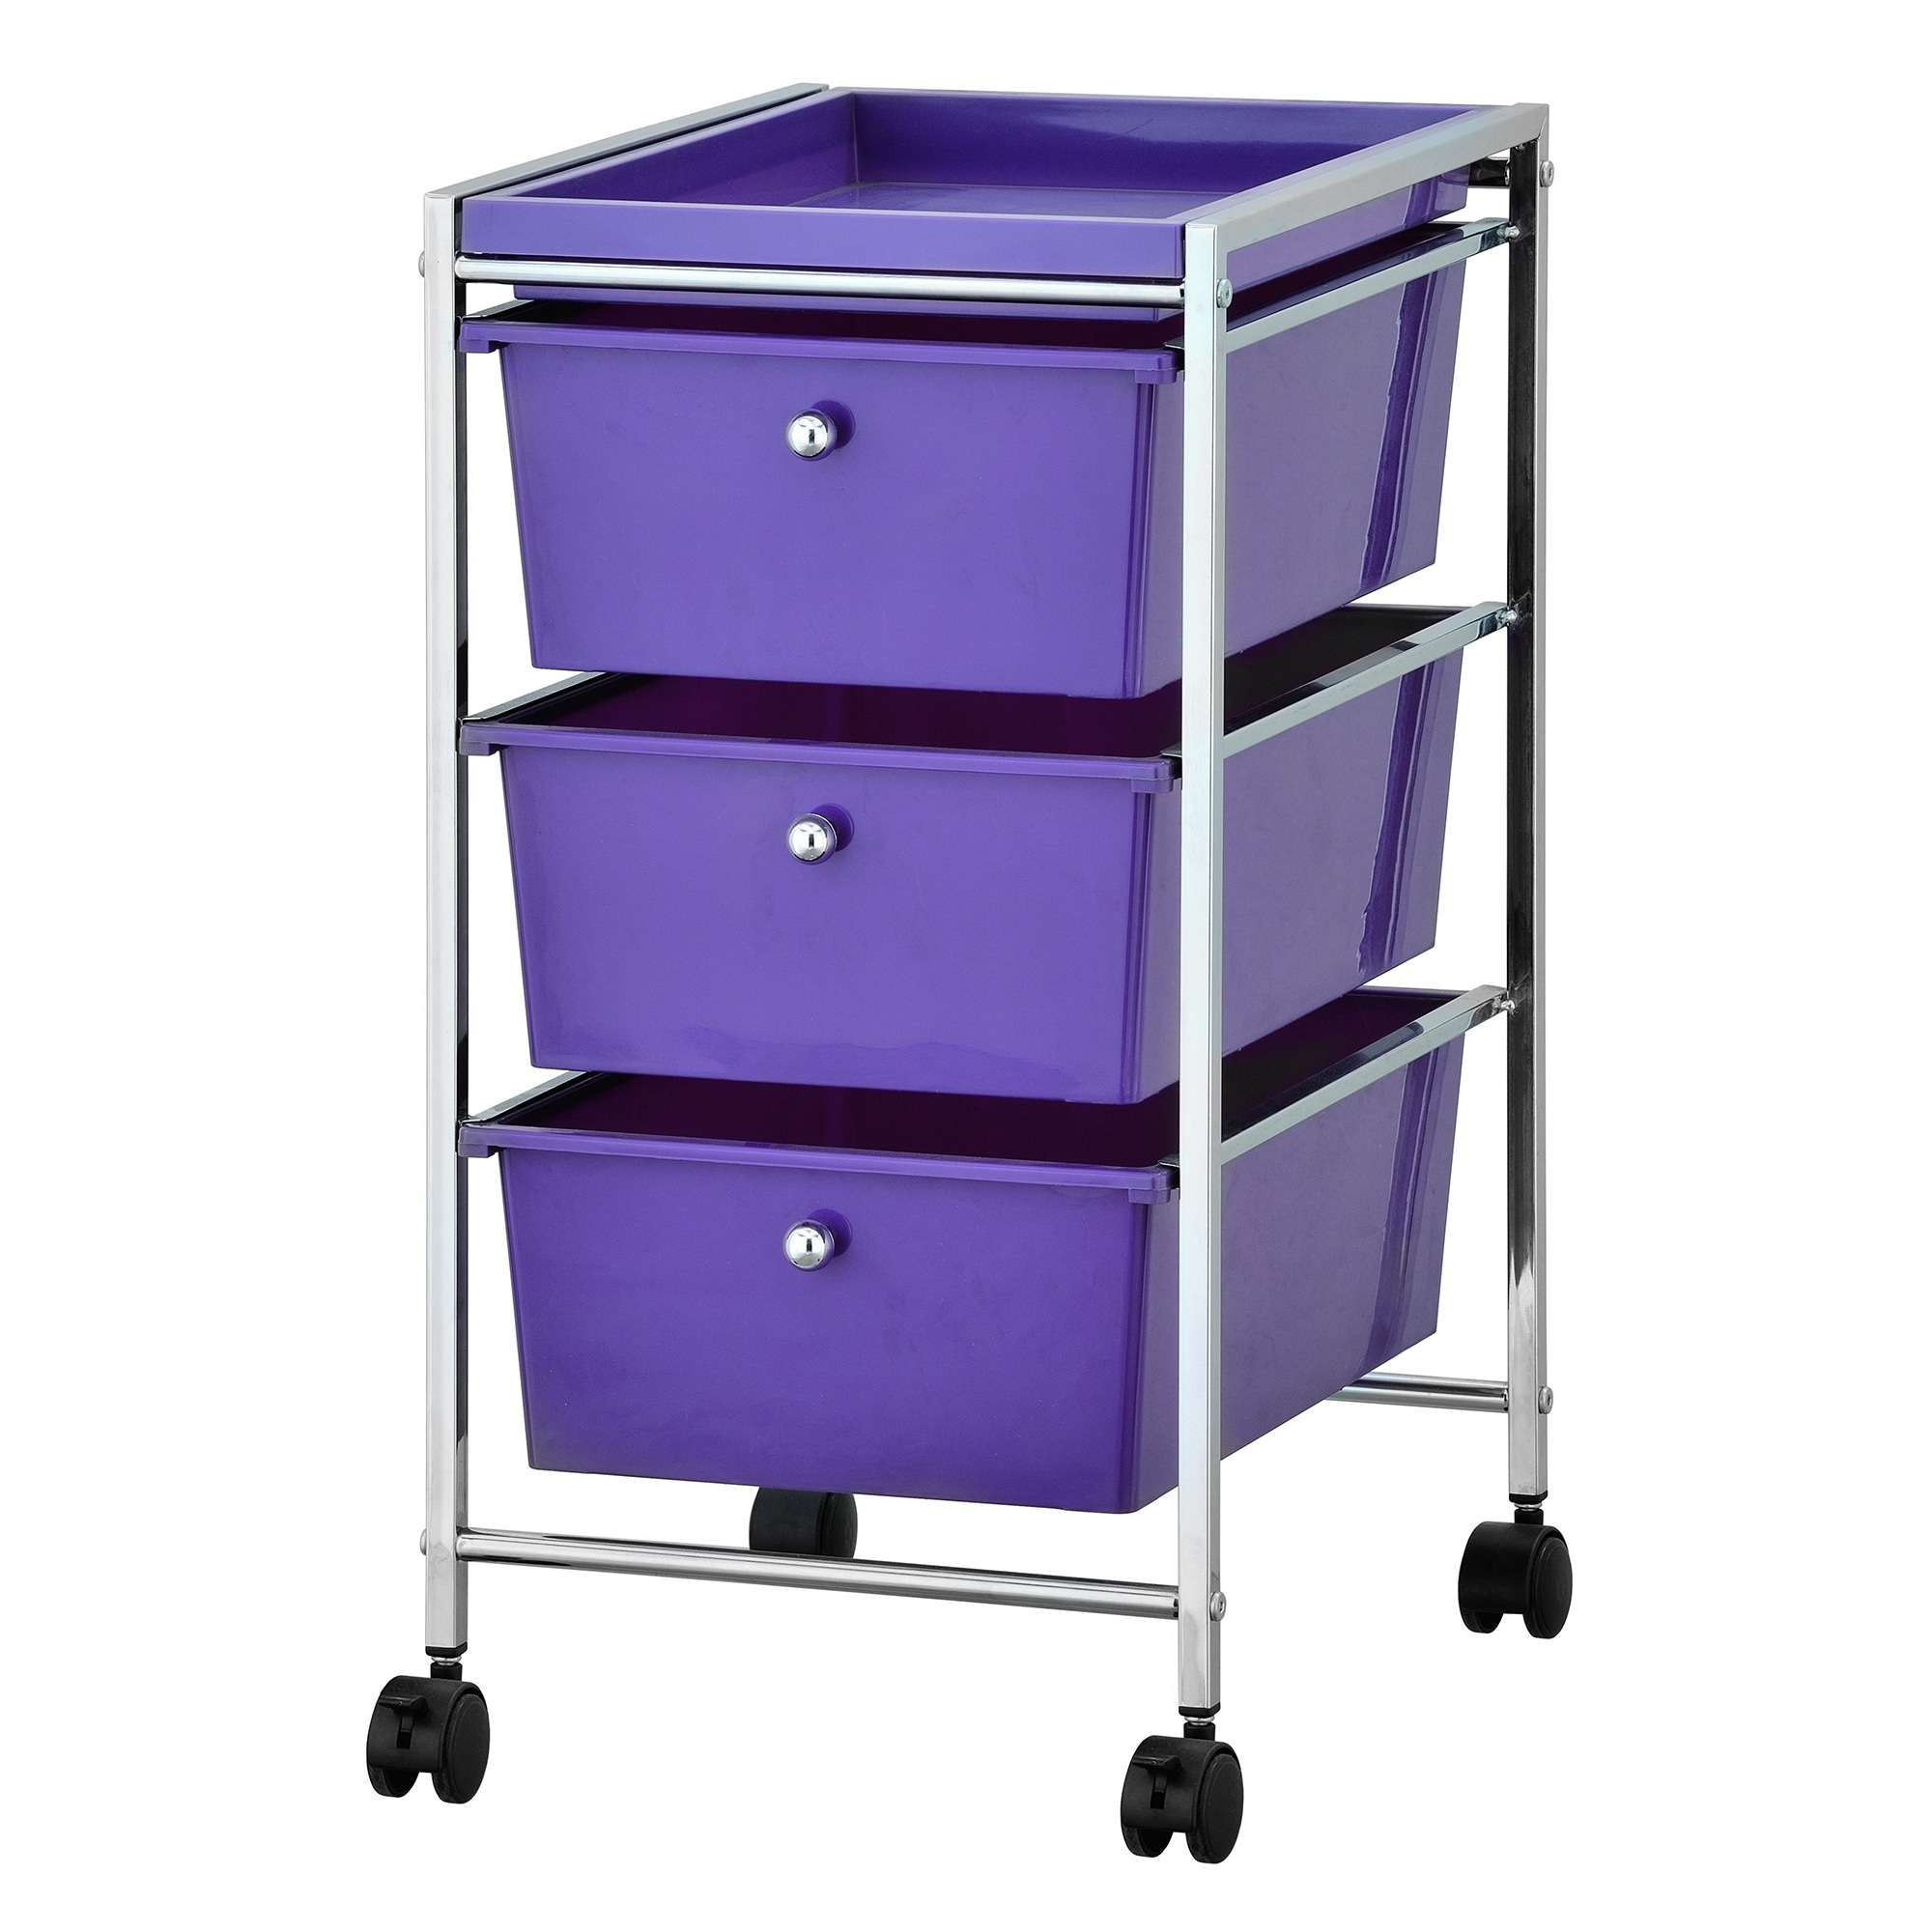 school oa jsp cart specialty html organizer ibegetwccimage rolling ibecctpitmdsprte x mobile storage xxssi canada drawers drawer inches